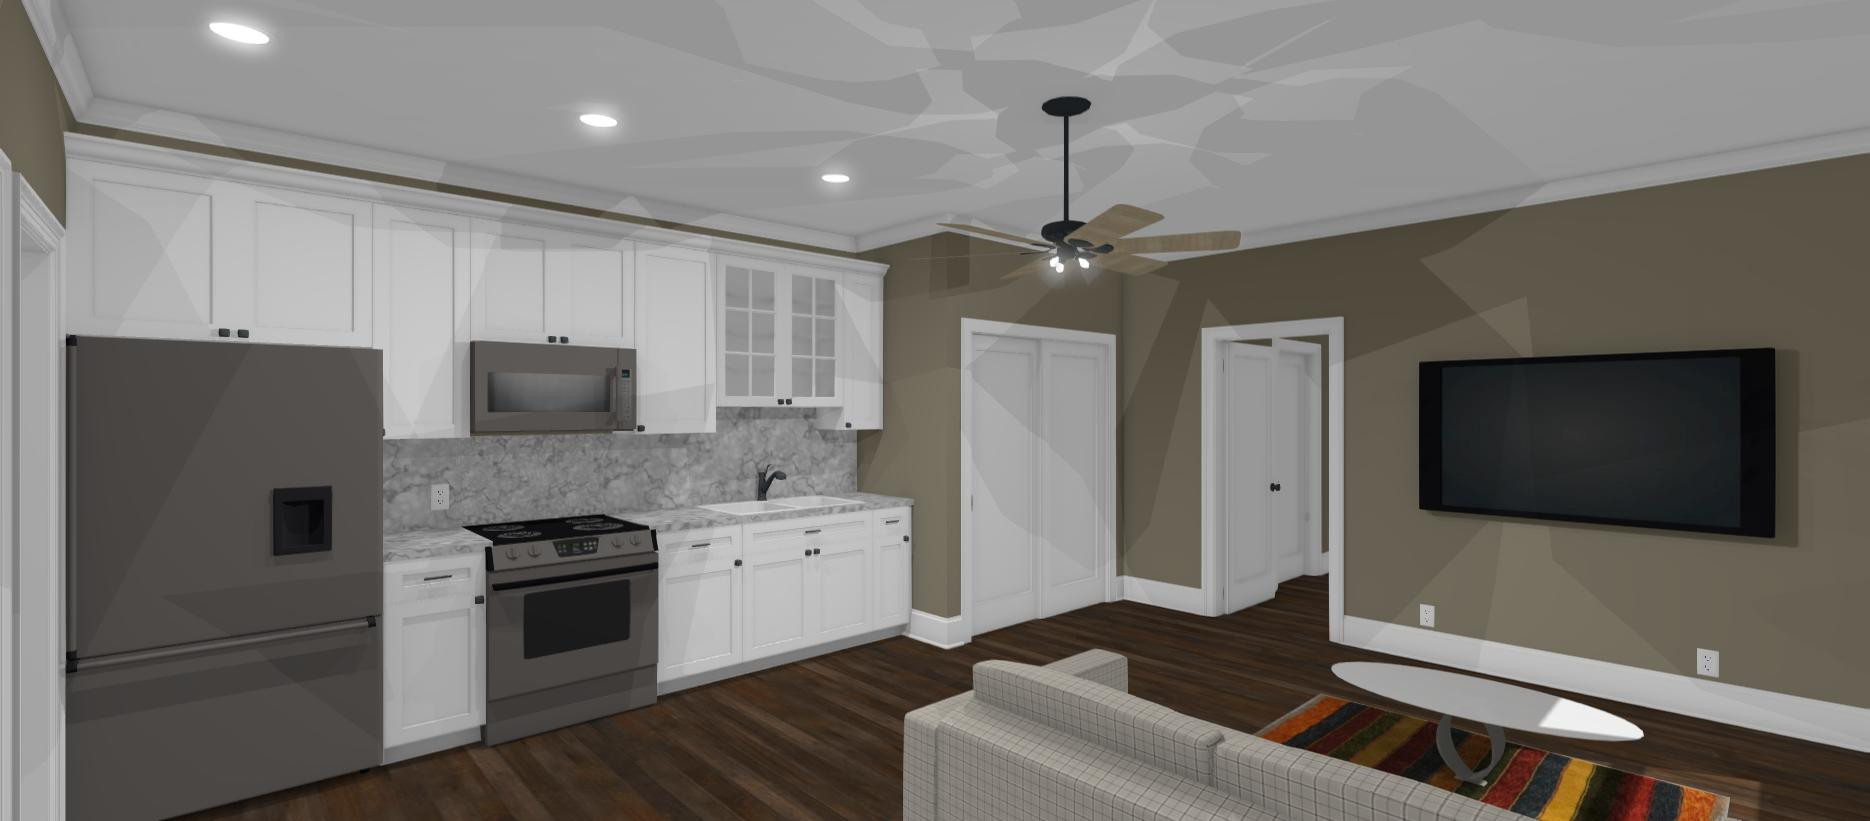 900 sf 2b2b kitchen view.jpg